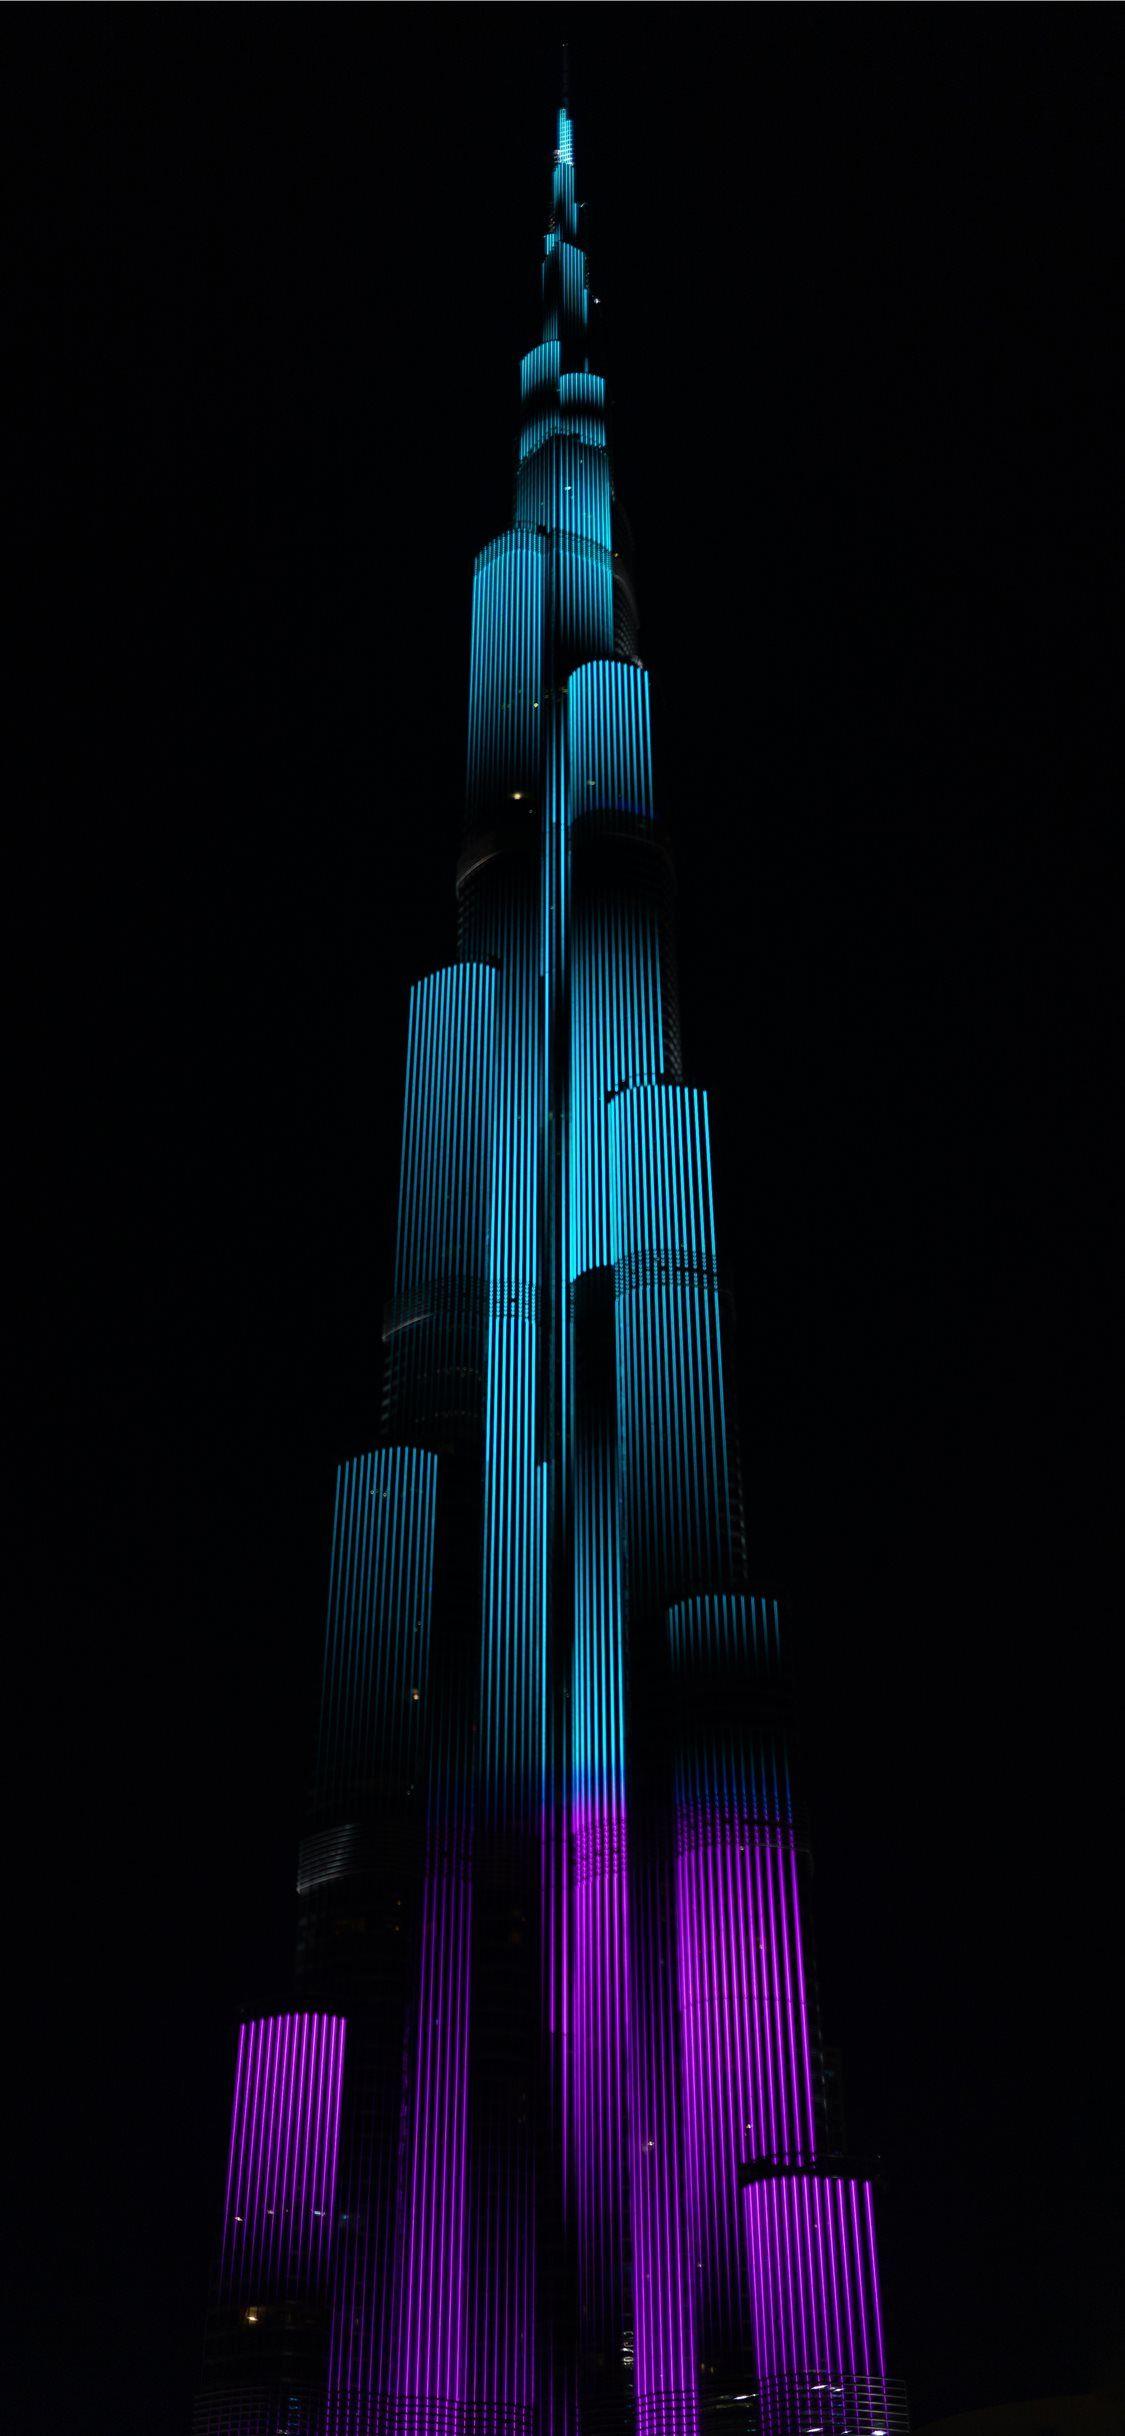 Burj Khalifa Dubai Uae Architecture Tower Spire Steeple Building Burjkhalifa Dubai Iphonexwal Oneplus Wallpapers Cityscape Wallpaper Iphone Wallpaper Burj khalifa night view hd wallpaper